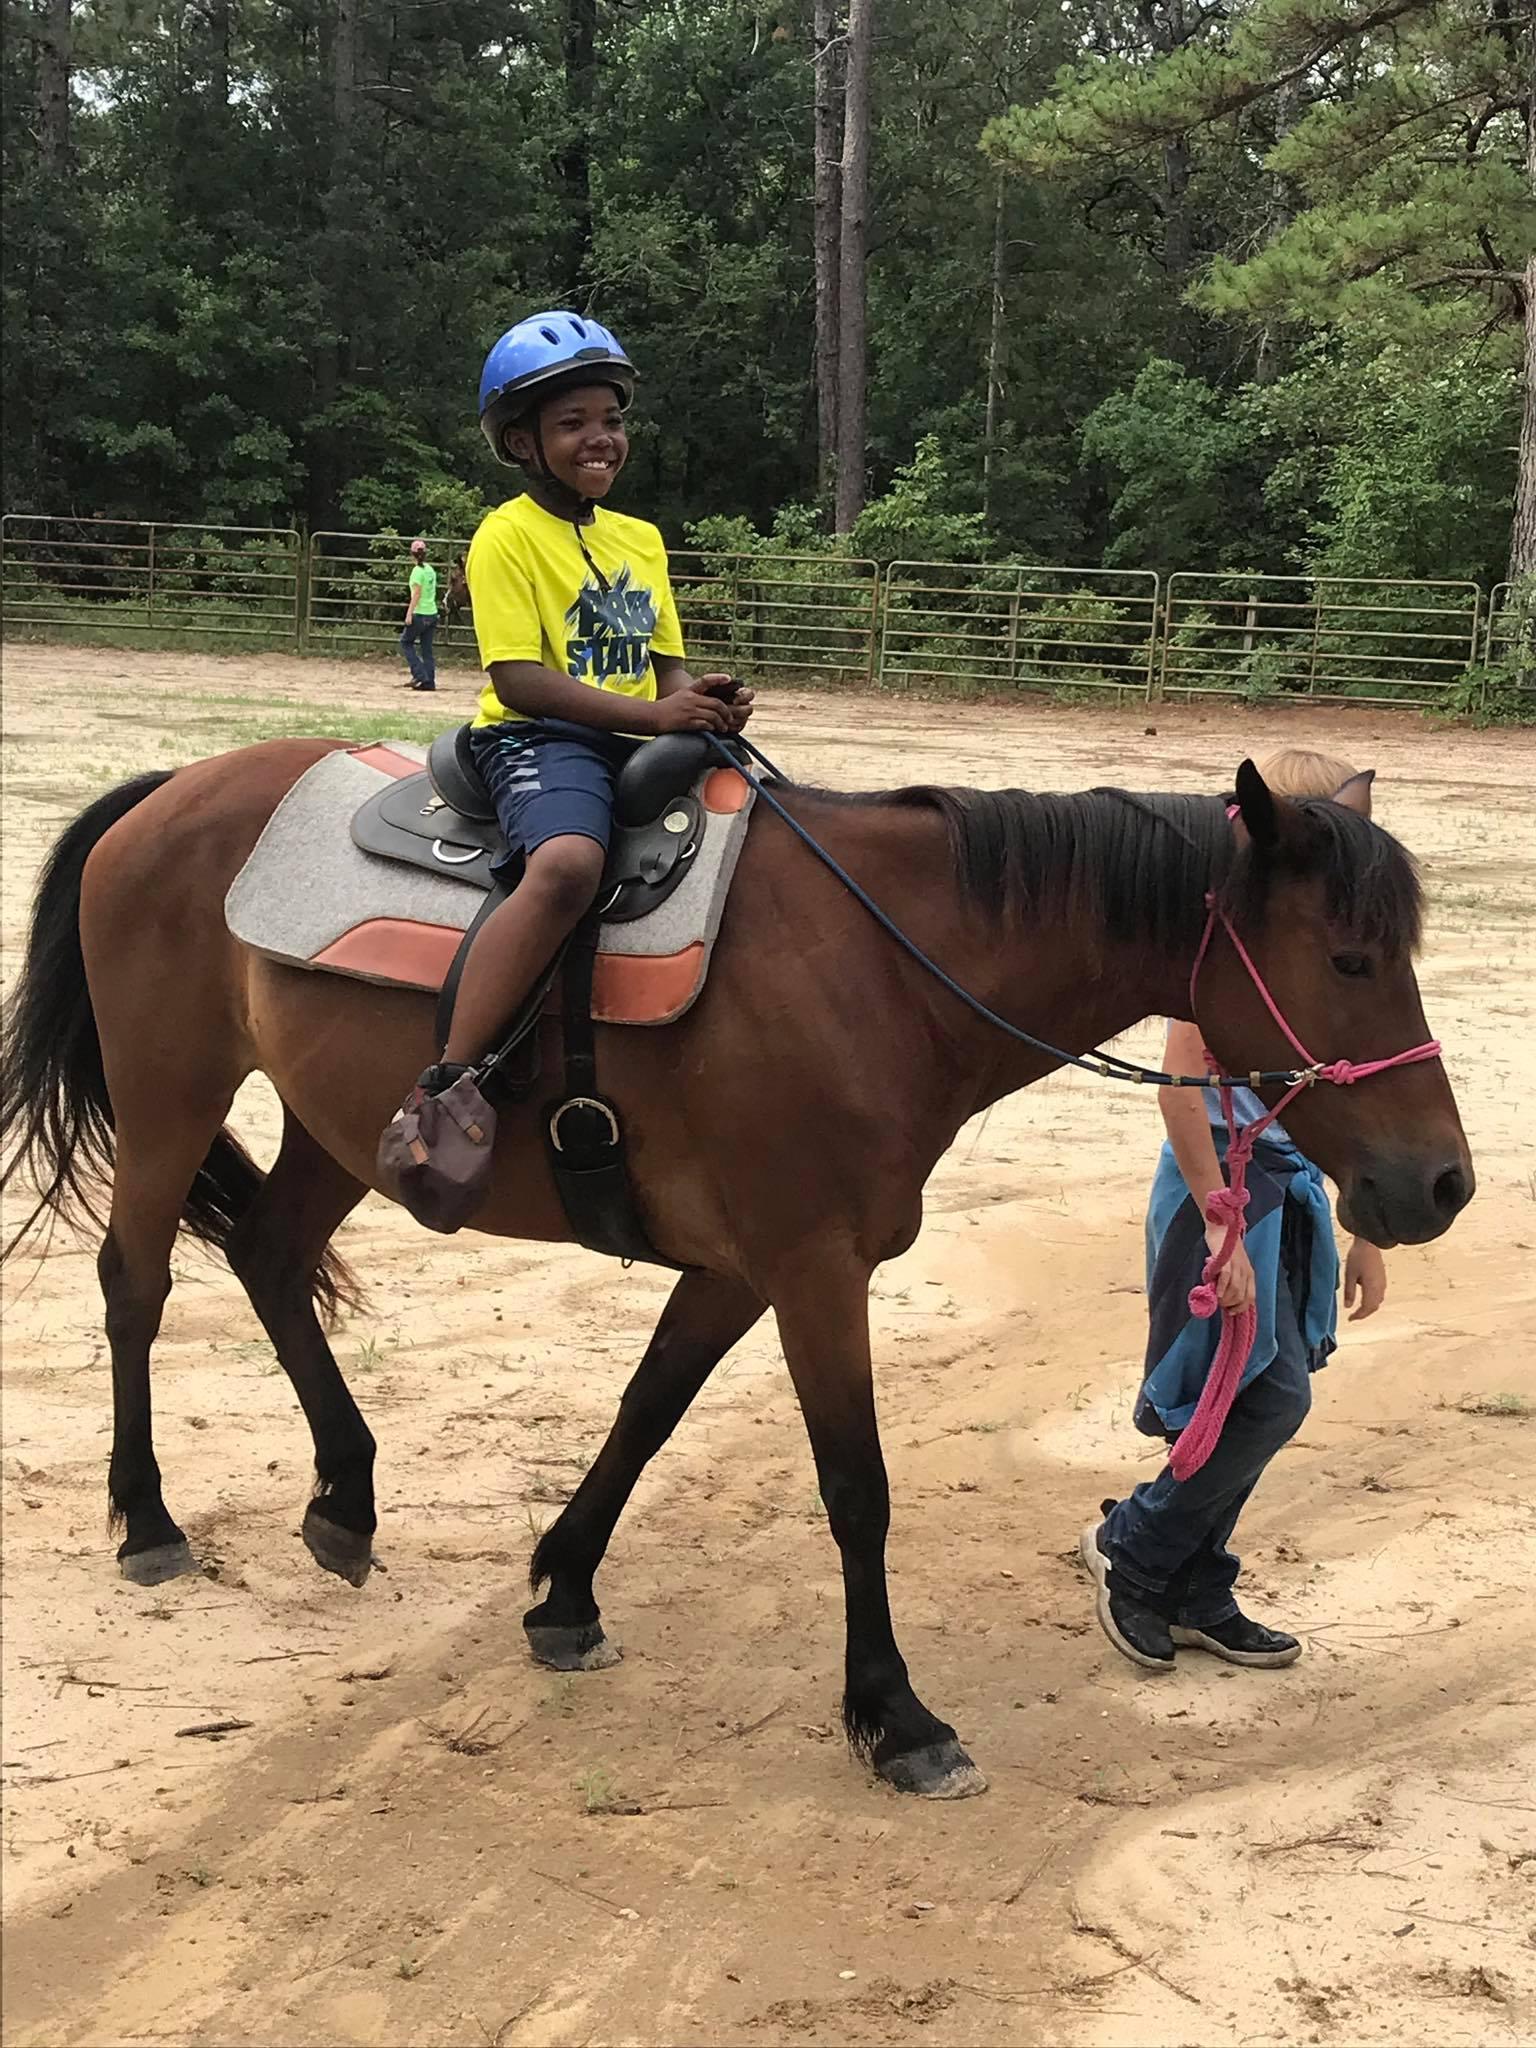 Camper riding horse image